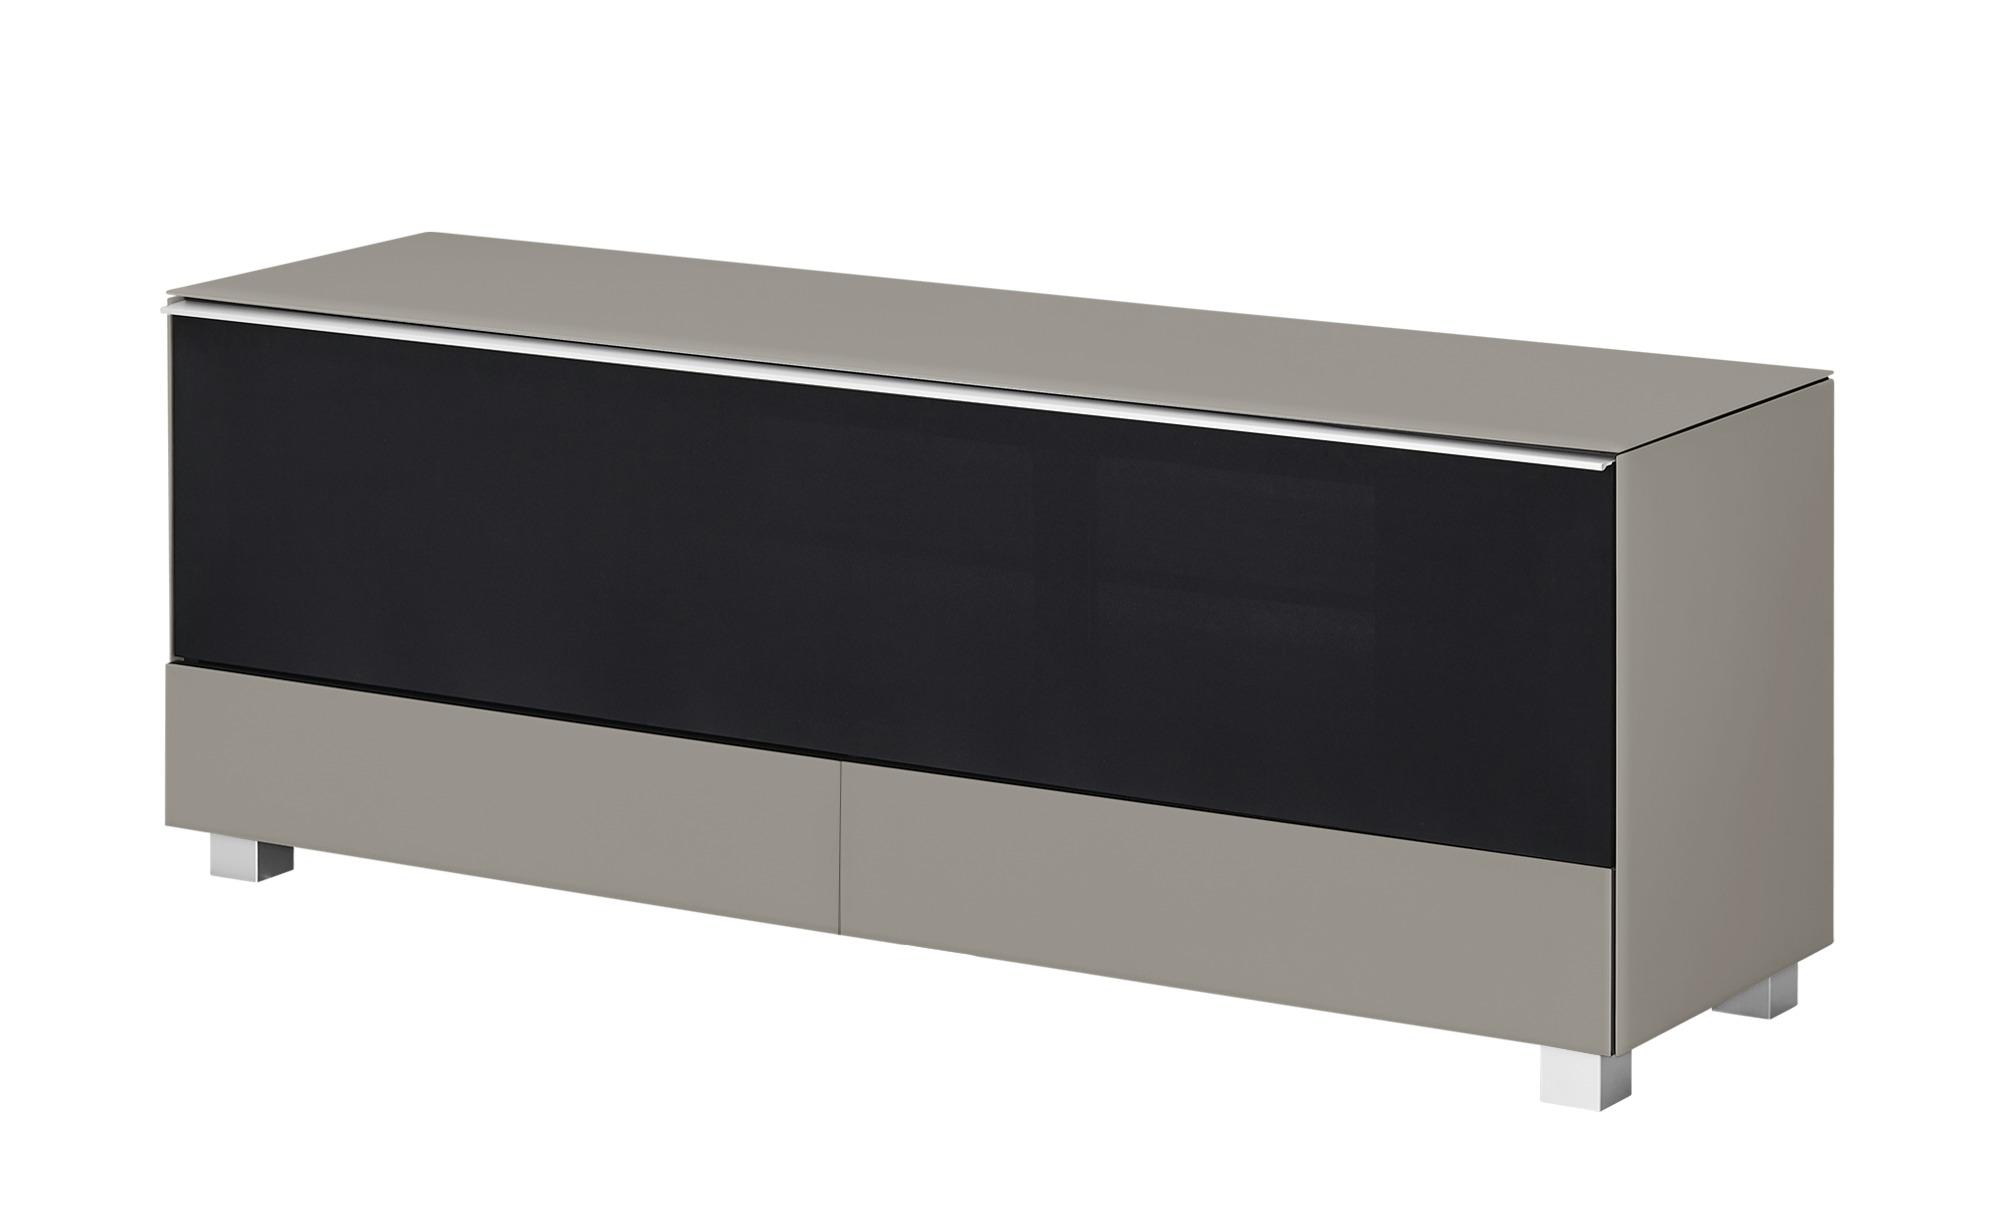 Soundboard  Soundbase M ¦ beige ¦ Maße (cm): B: 160 H: 60 T: 42 TV- & Media Möbel > TV-Schränke - Höffner